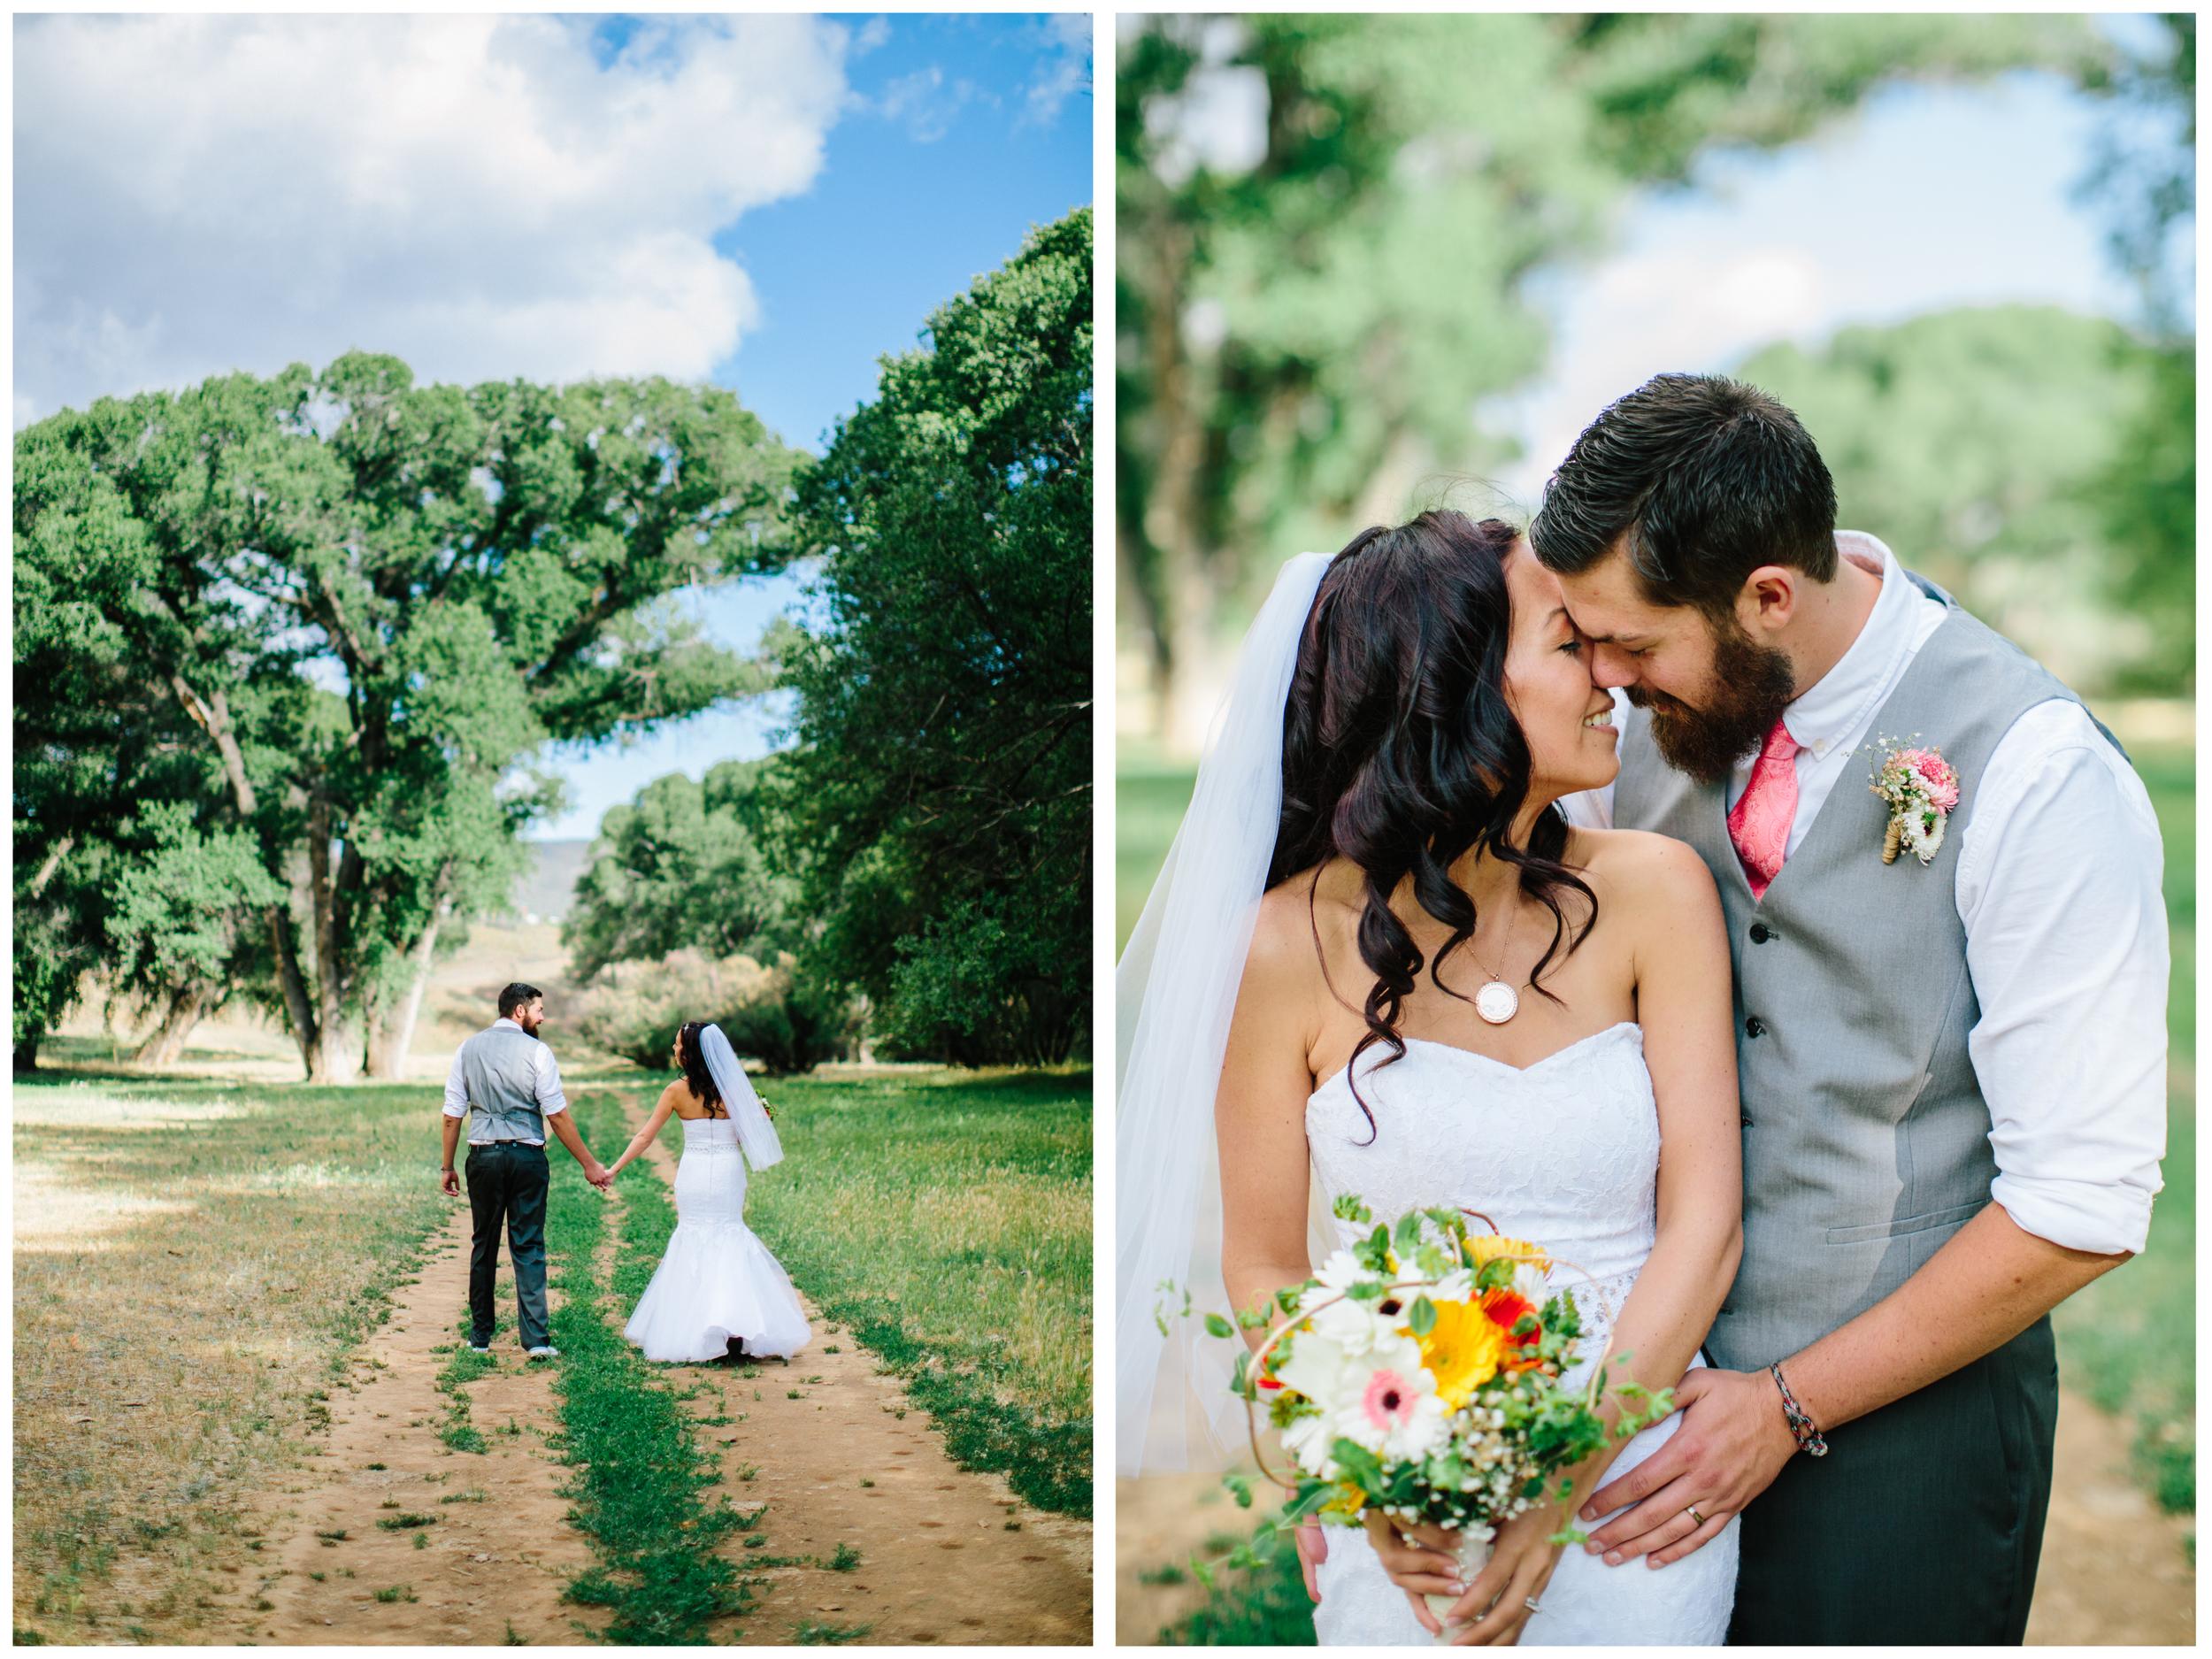 Prescott-Wedding-Photographer-Dip-4.jpg